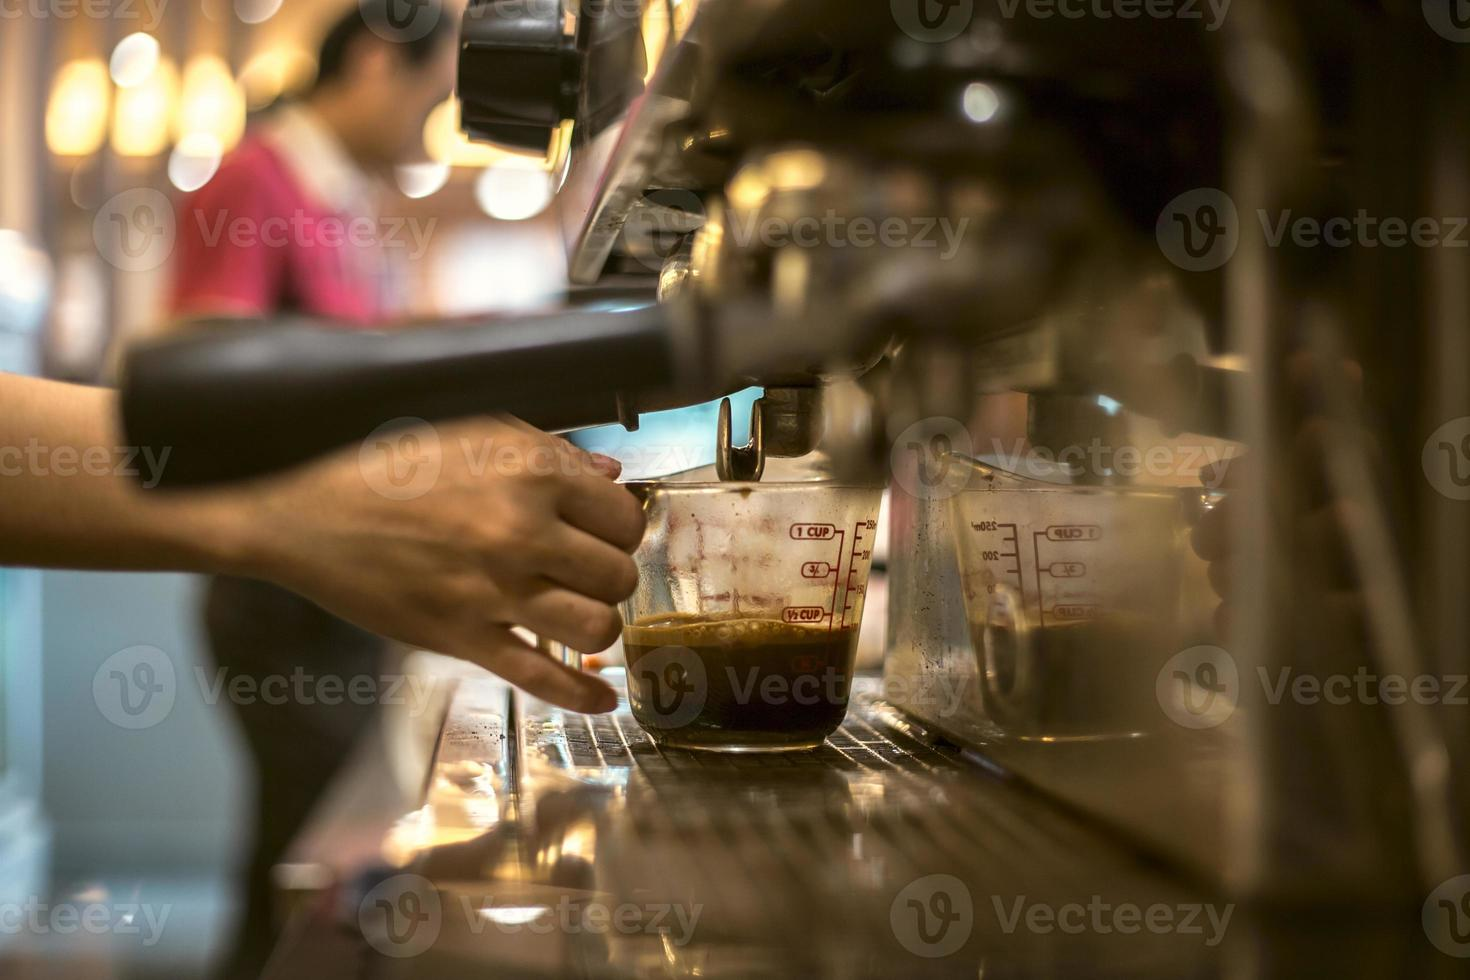 Coffee machine, close up photo